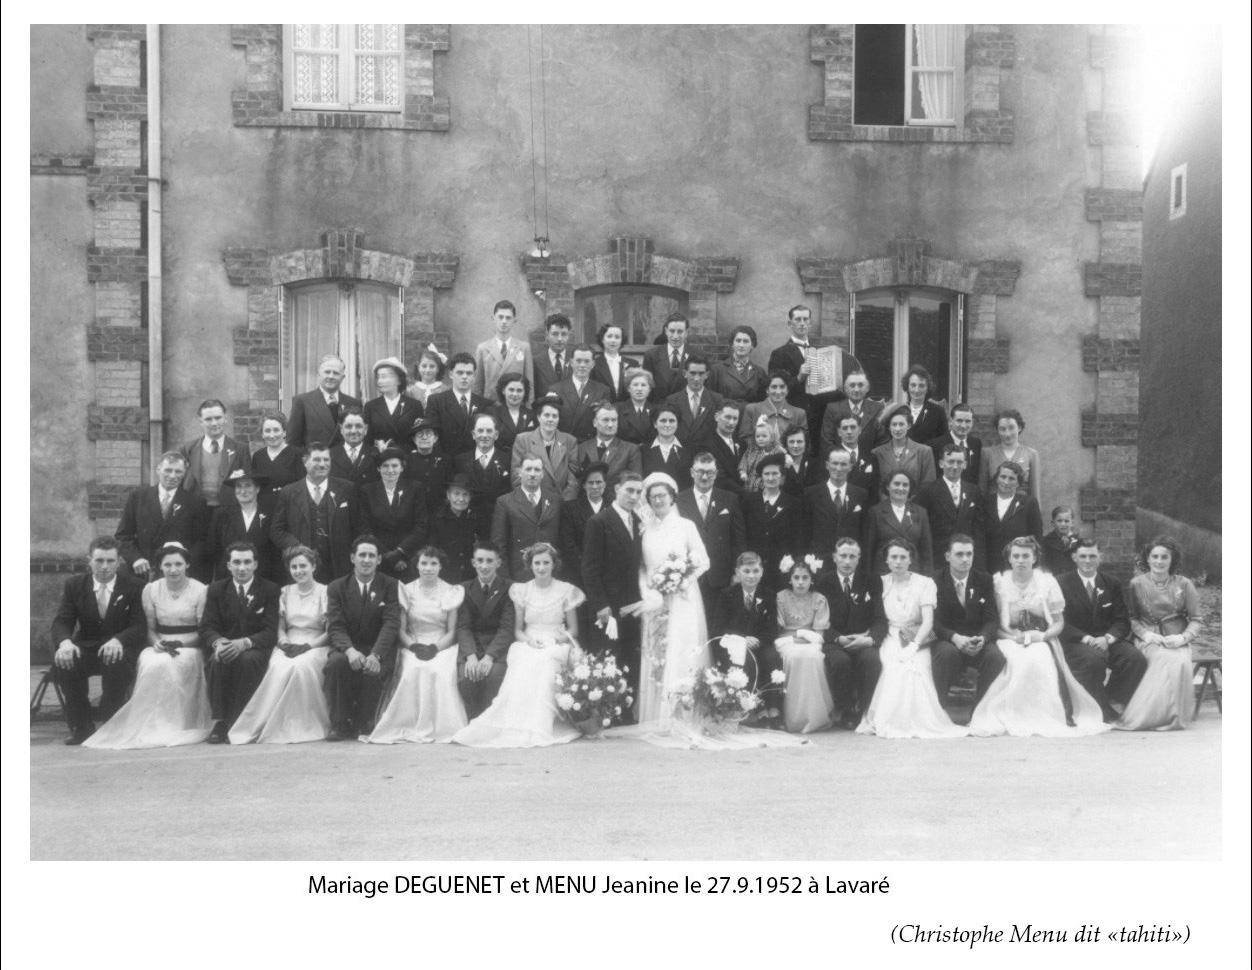 Lavaré - Mariage - DEGUENET et MENU Jeanine - 1952 (Christophe Menu dit Tahiti)